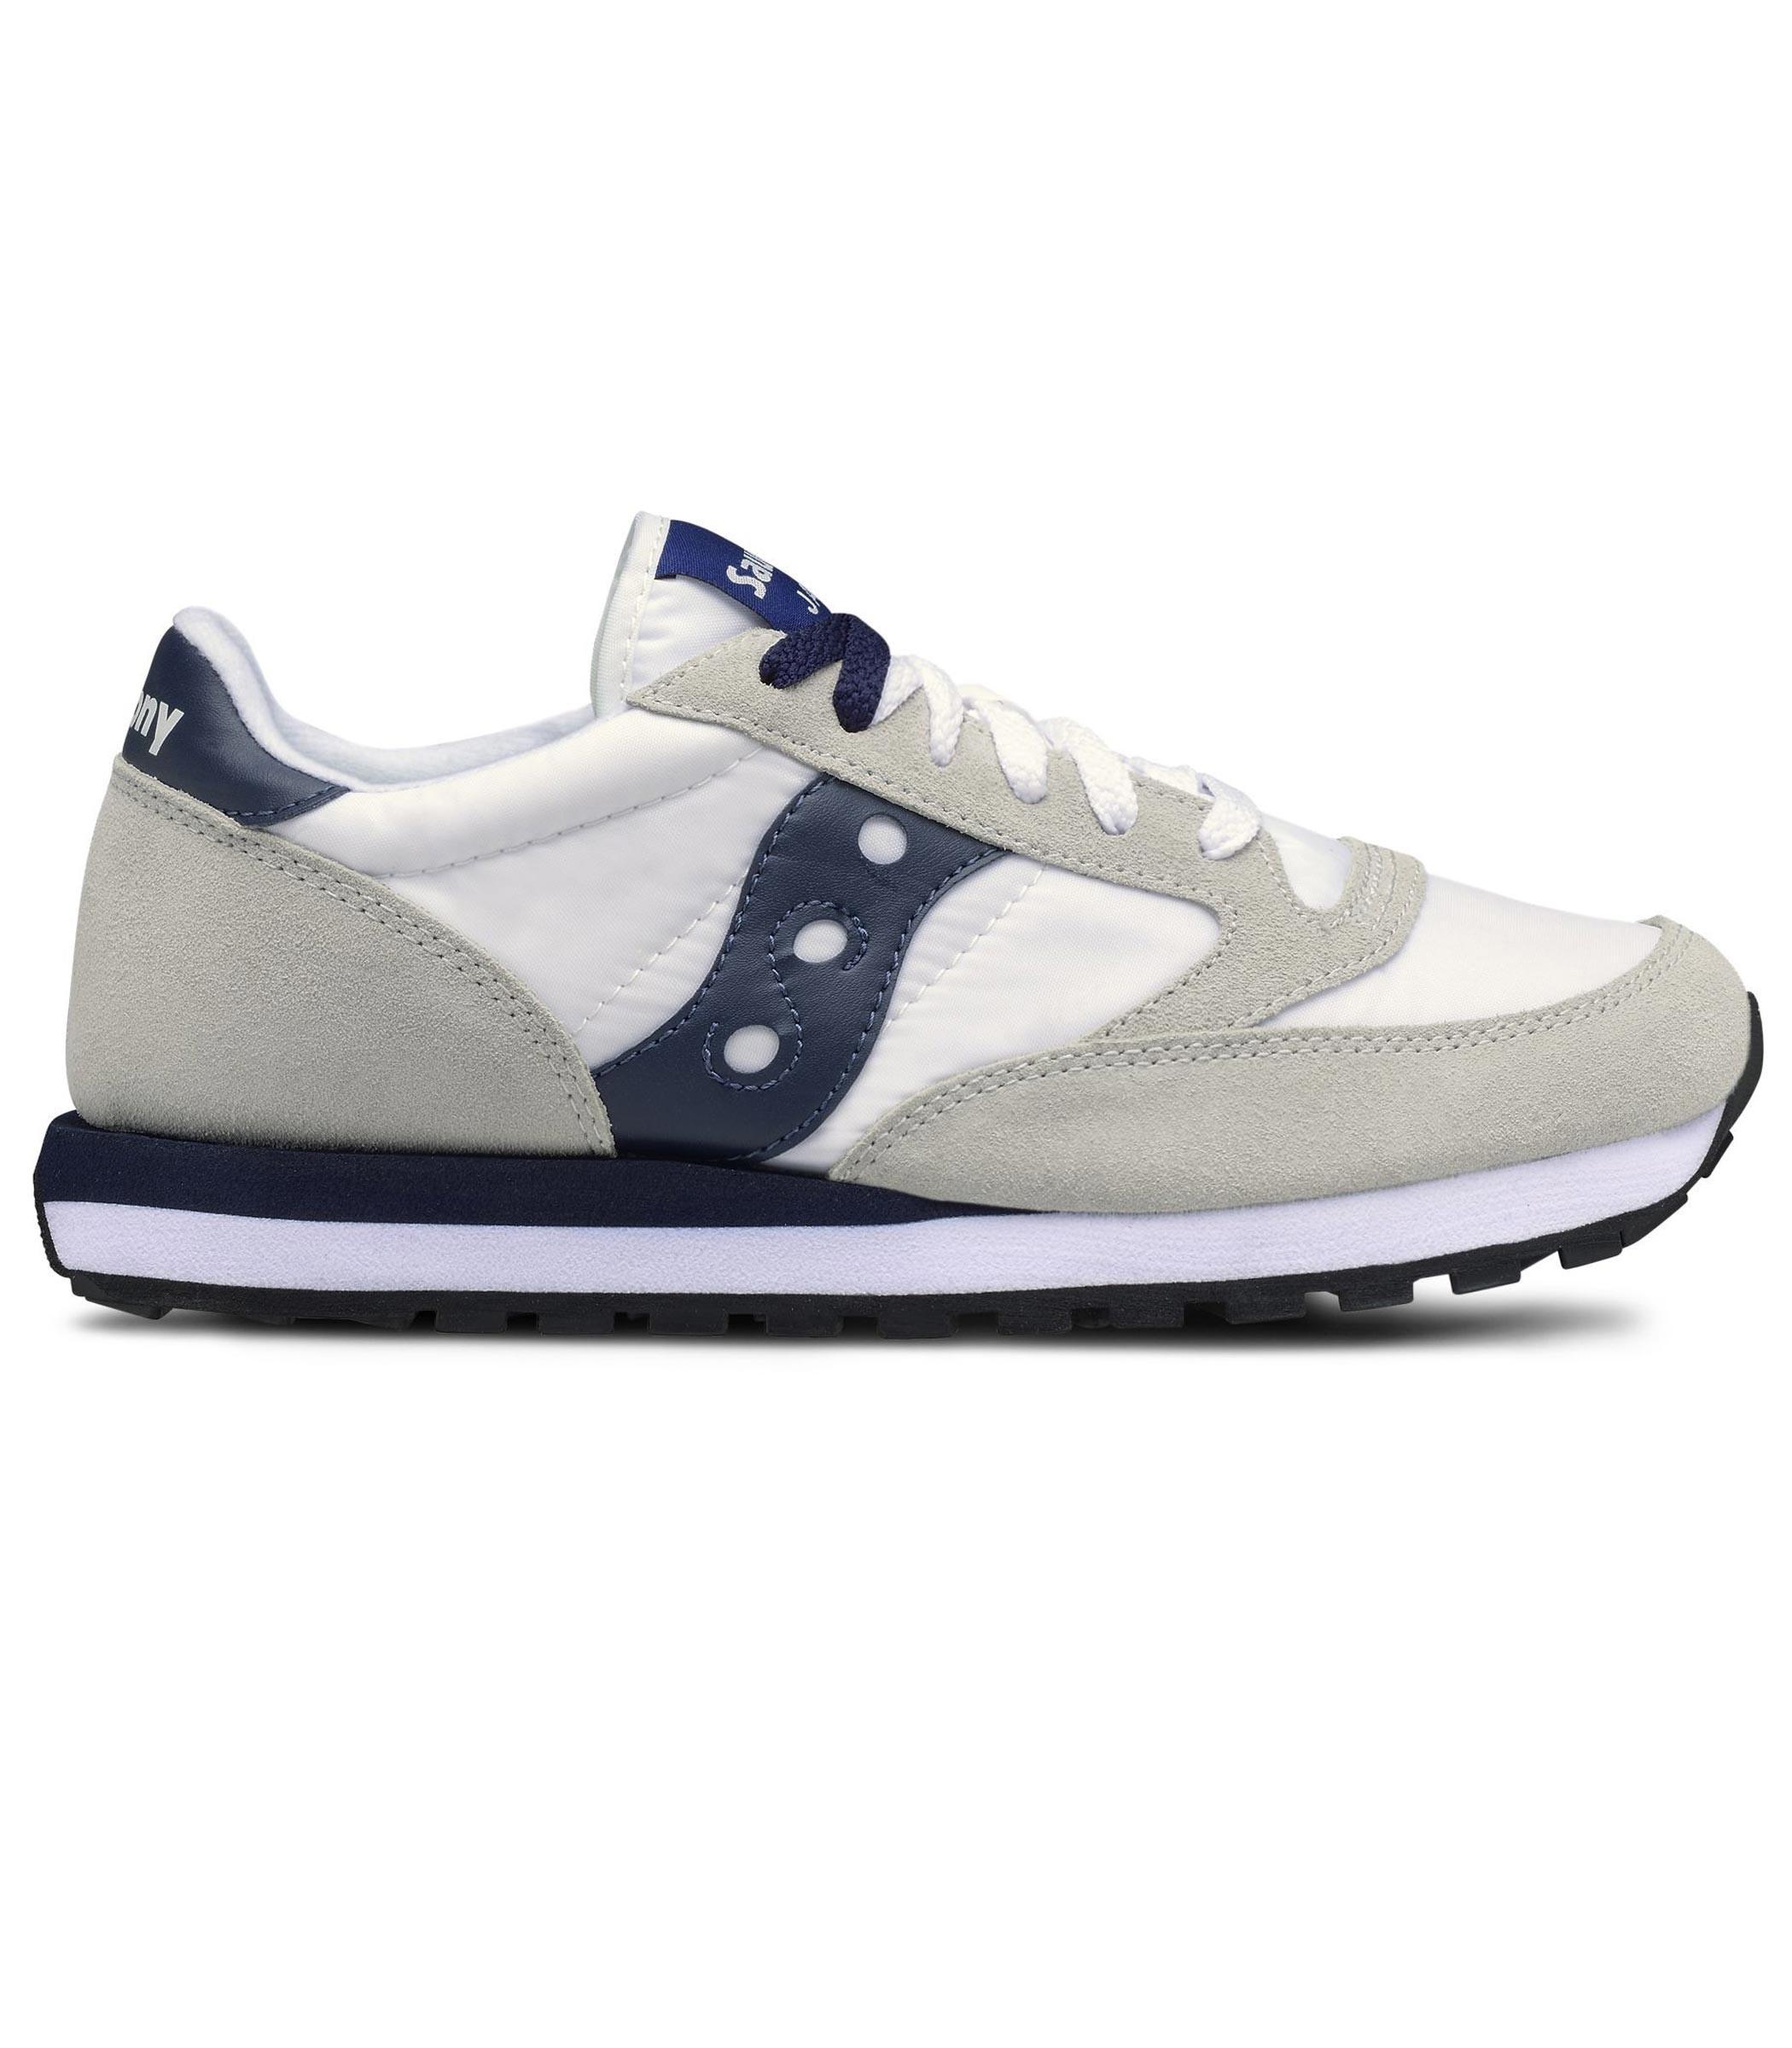 quality design fbaeb 09597 Scarpe Sneakers Saucony Jazz Original da uomo rif. S2044-331